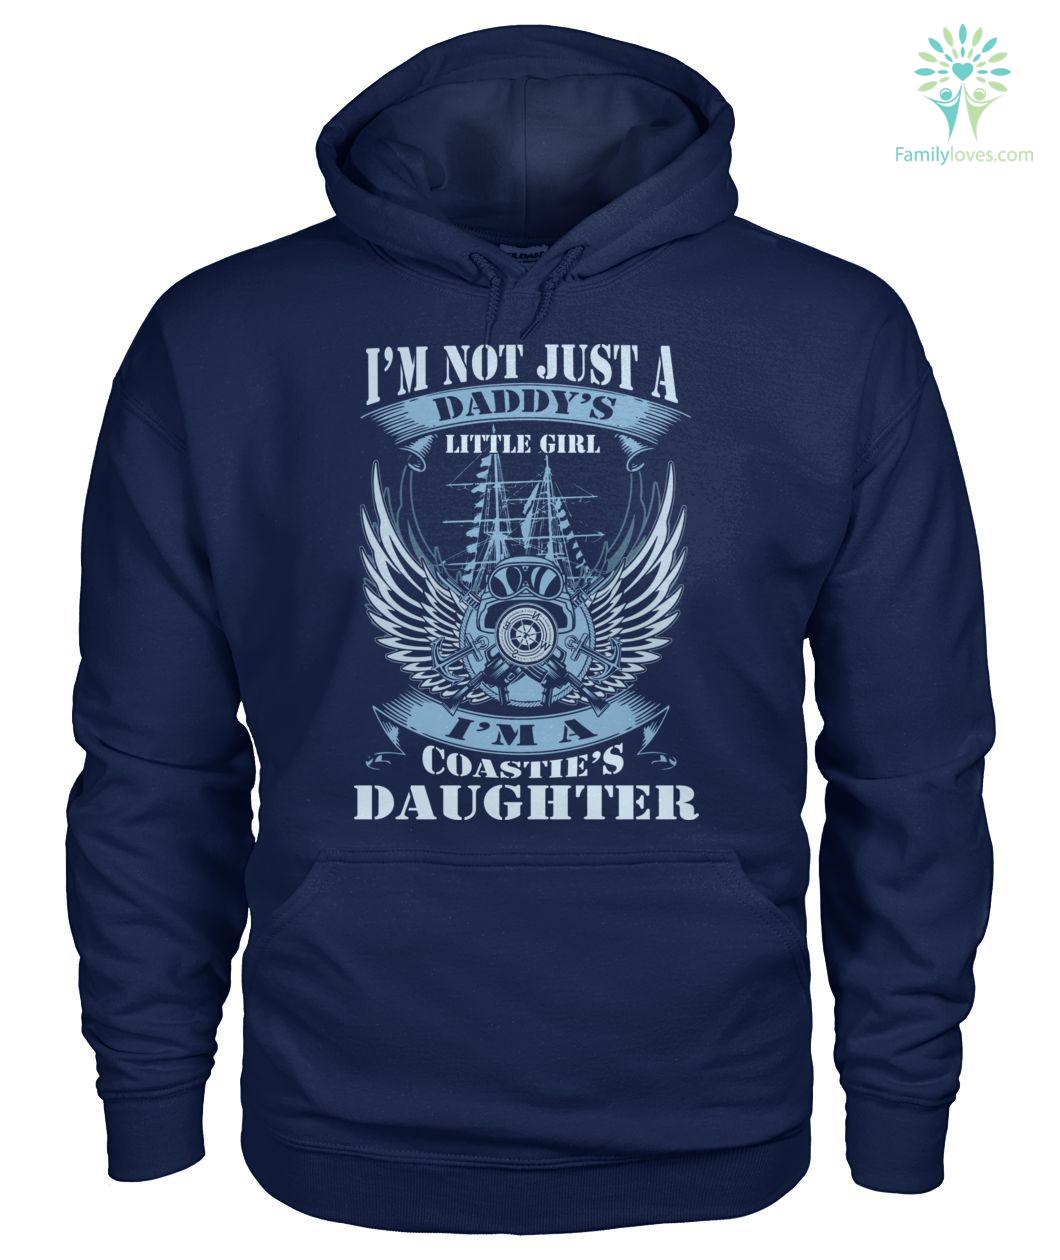 i-m-not_6163b800-8920-5d51-1d46-980c1b8e2650 i'm not just a daddy's little girl i'm a coastie's daughter Hoodies/Tshirt  %tag